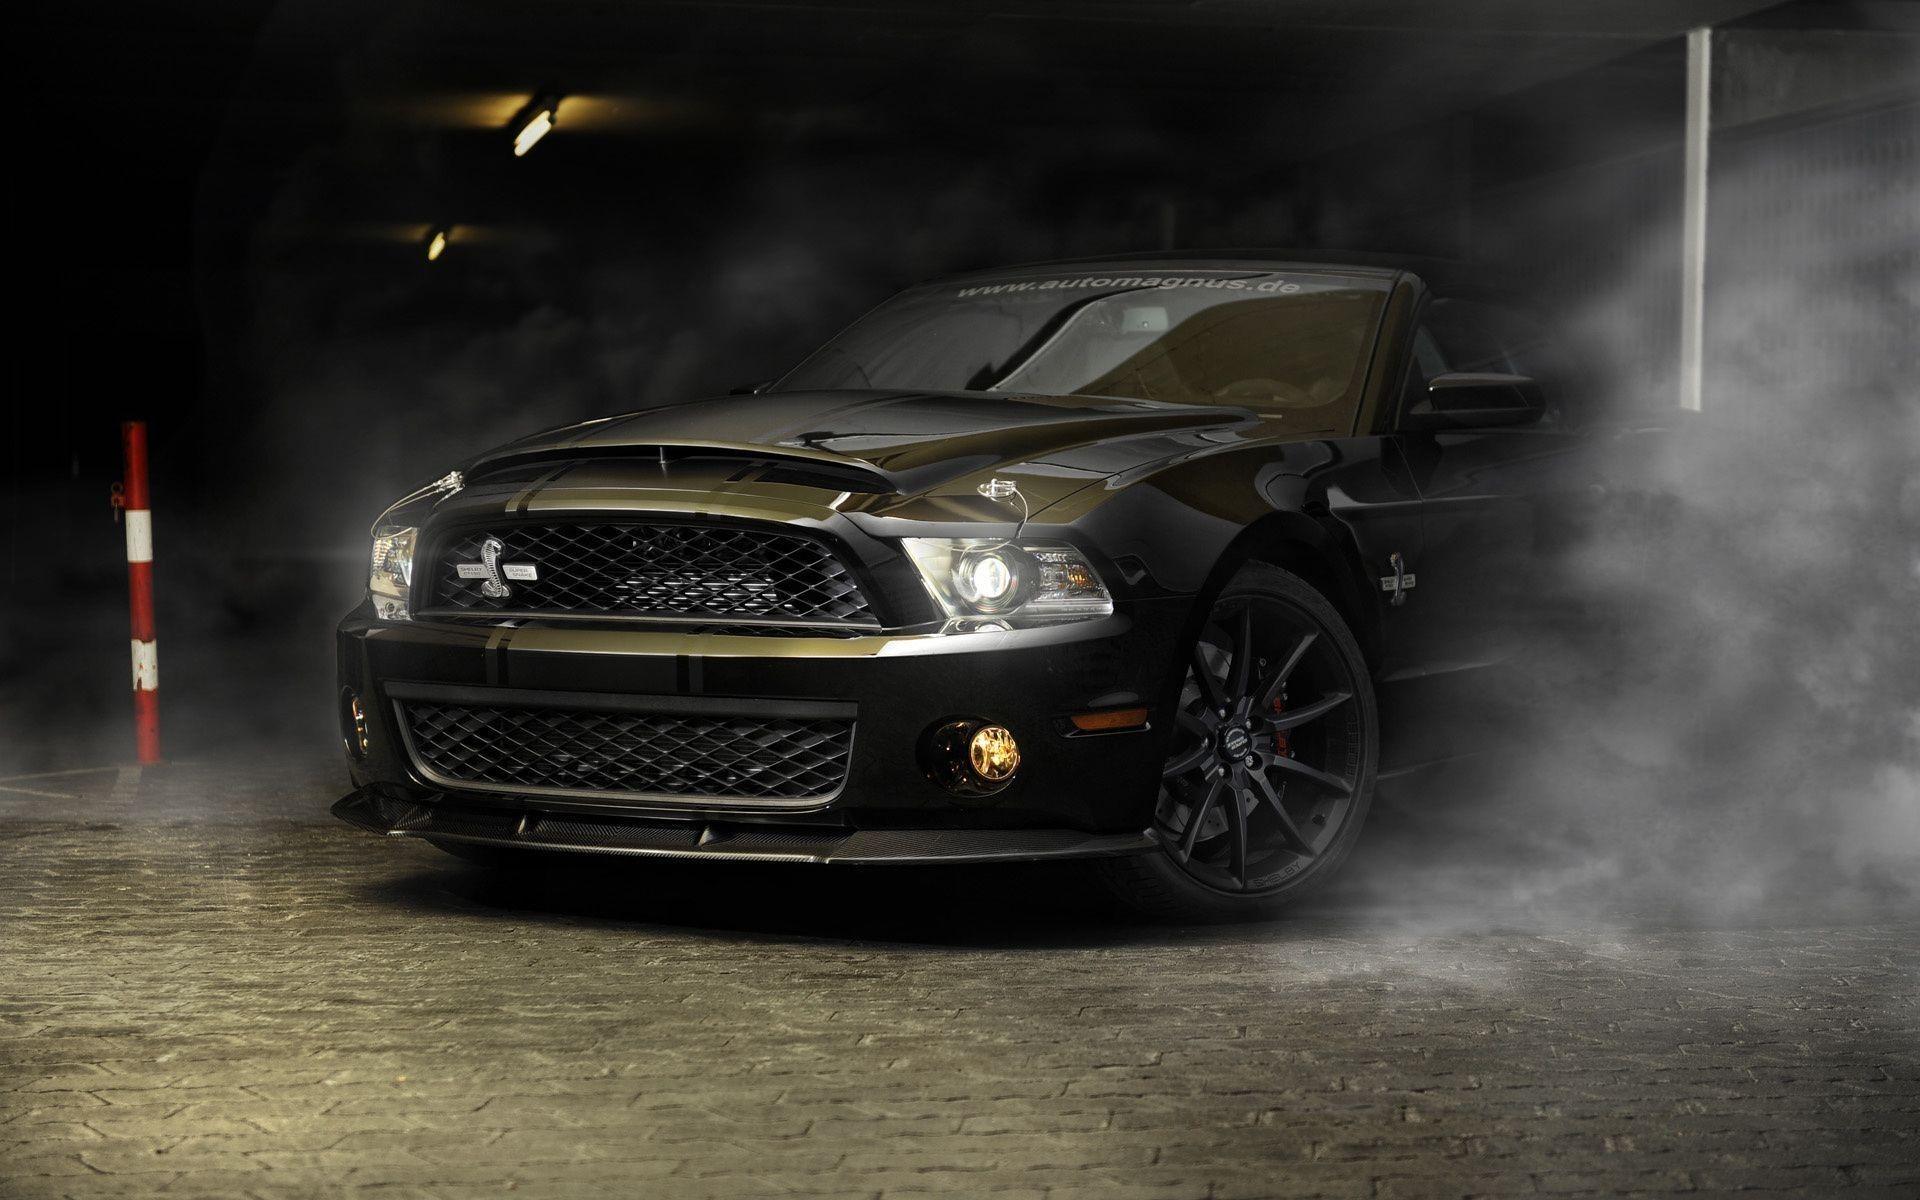 Mustang UHD Wallpapers